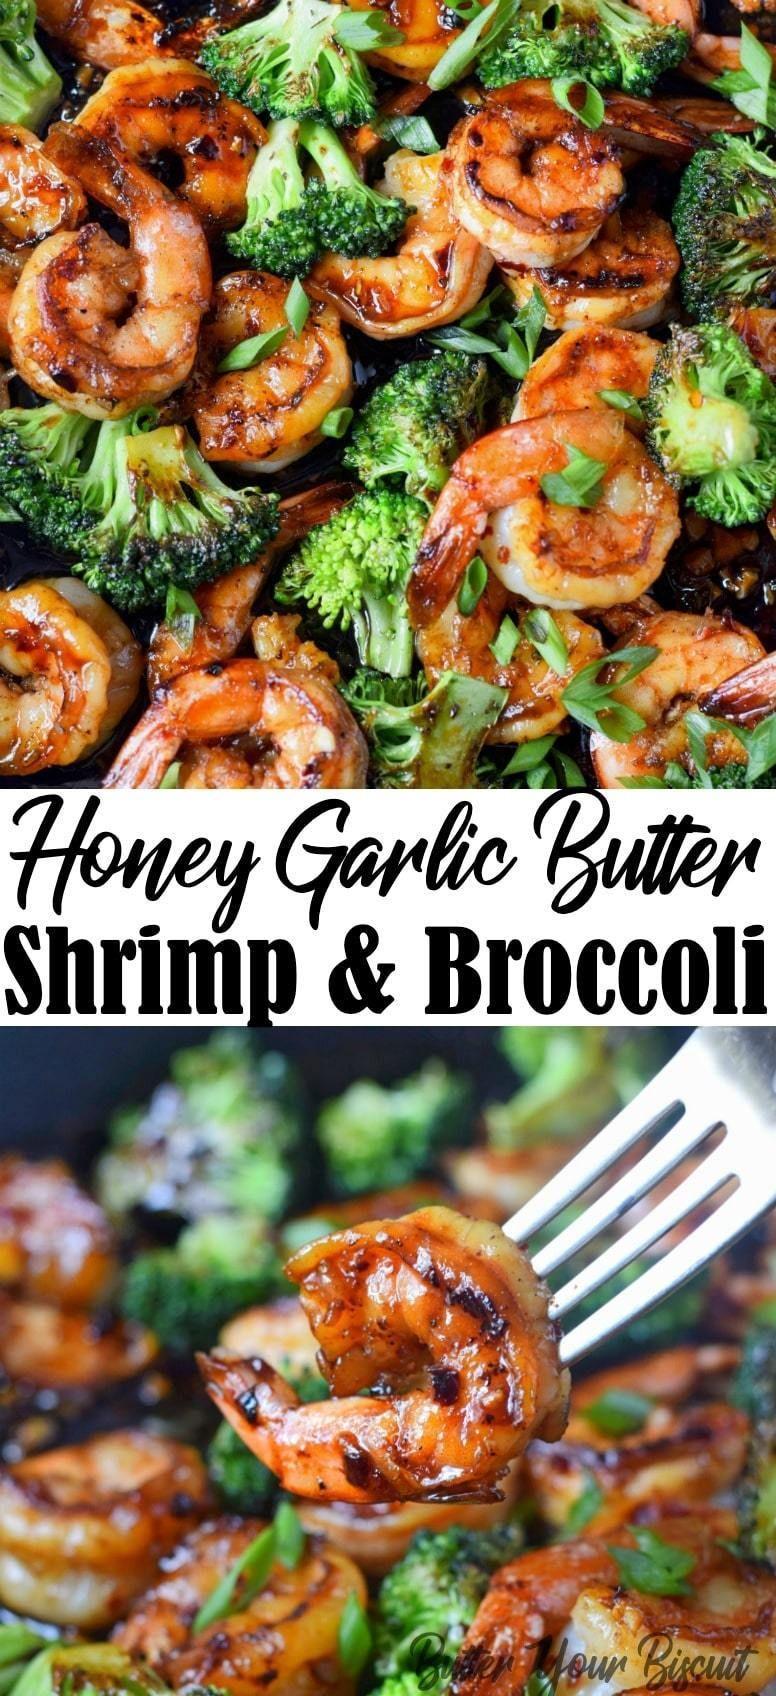 Honey Garlic Butter Shrimp & Broccoli images